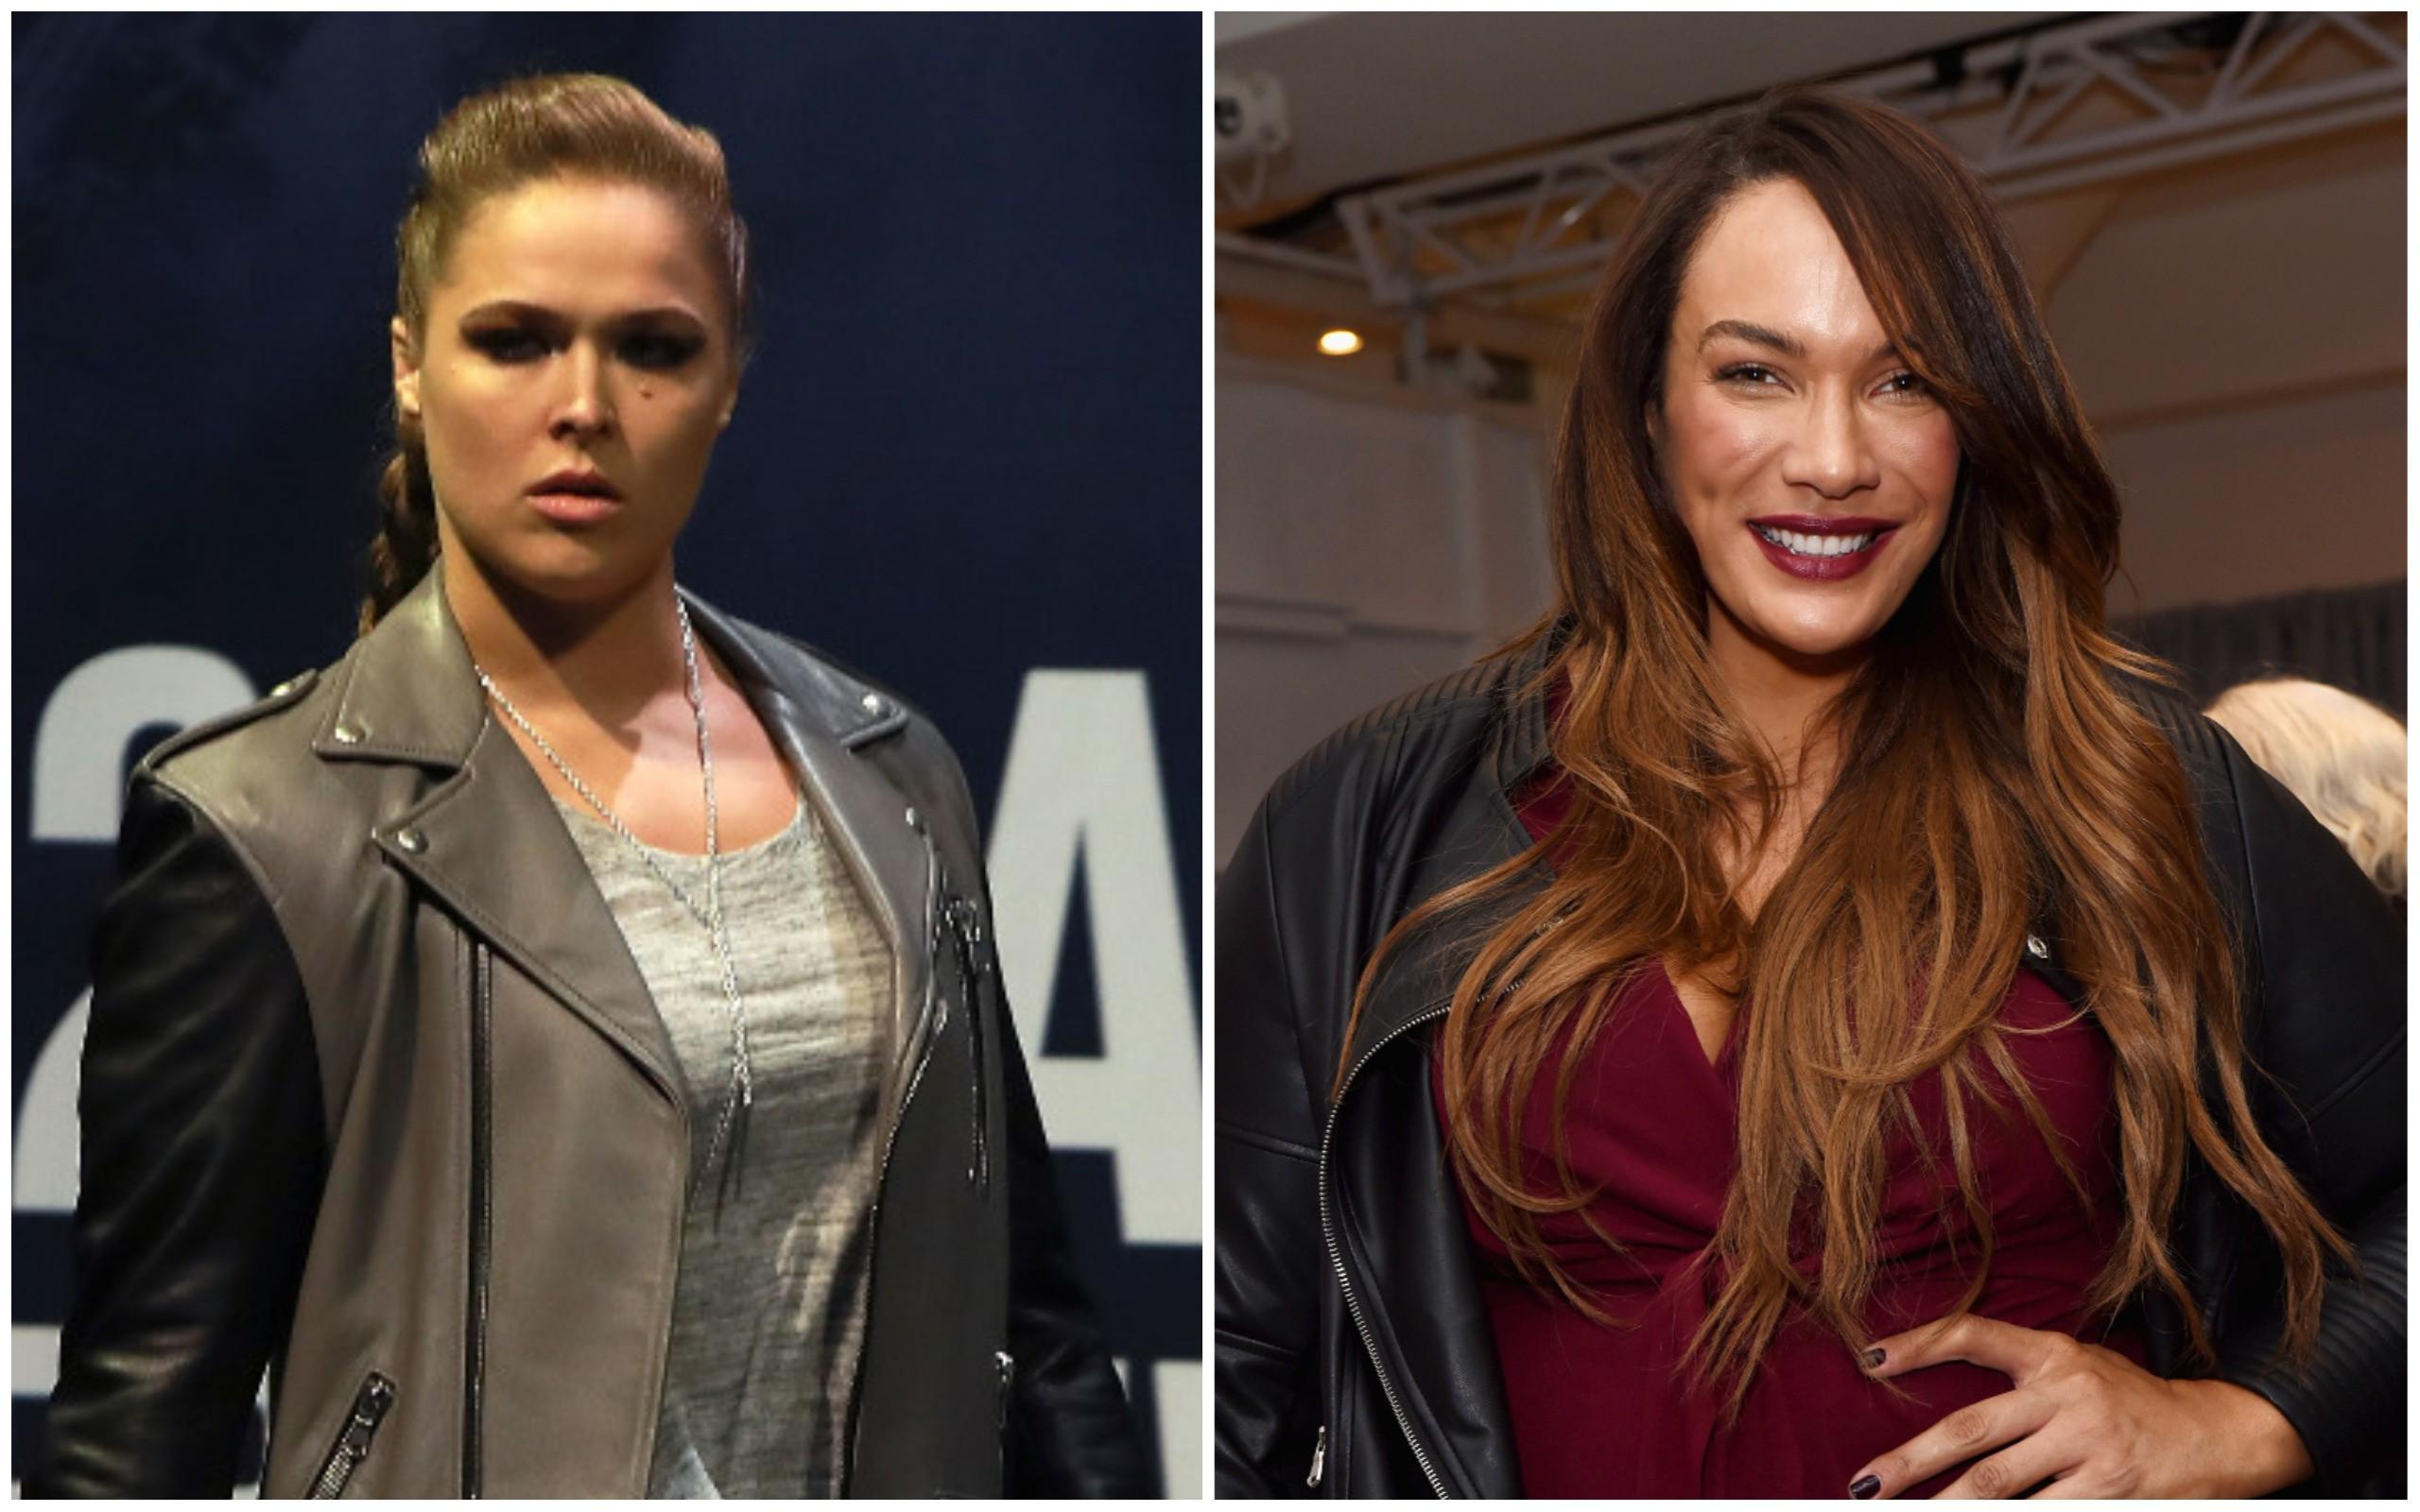 Ronda Rousey e Nia Jax (Foto: Getty Images)